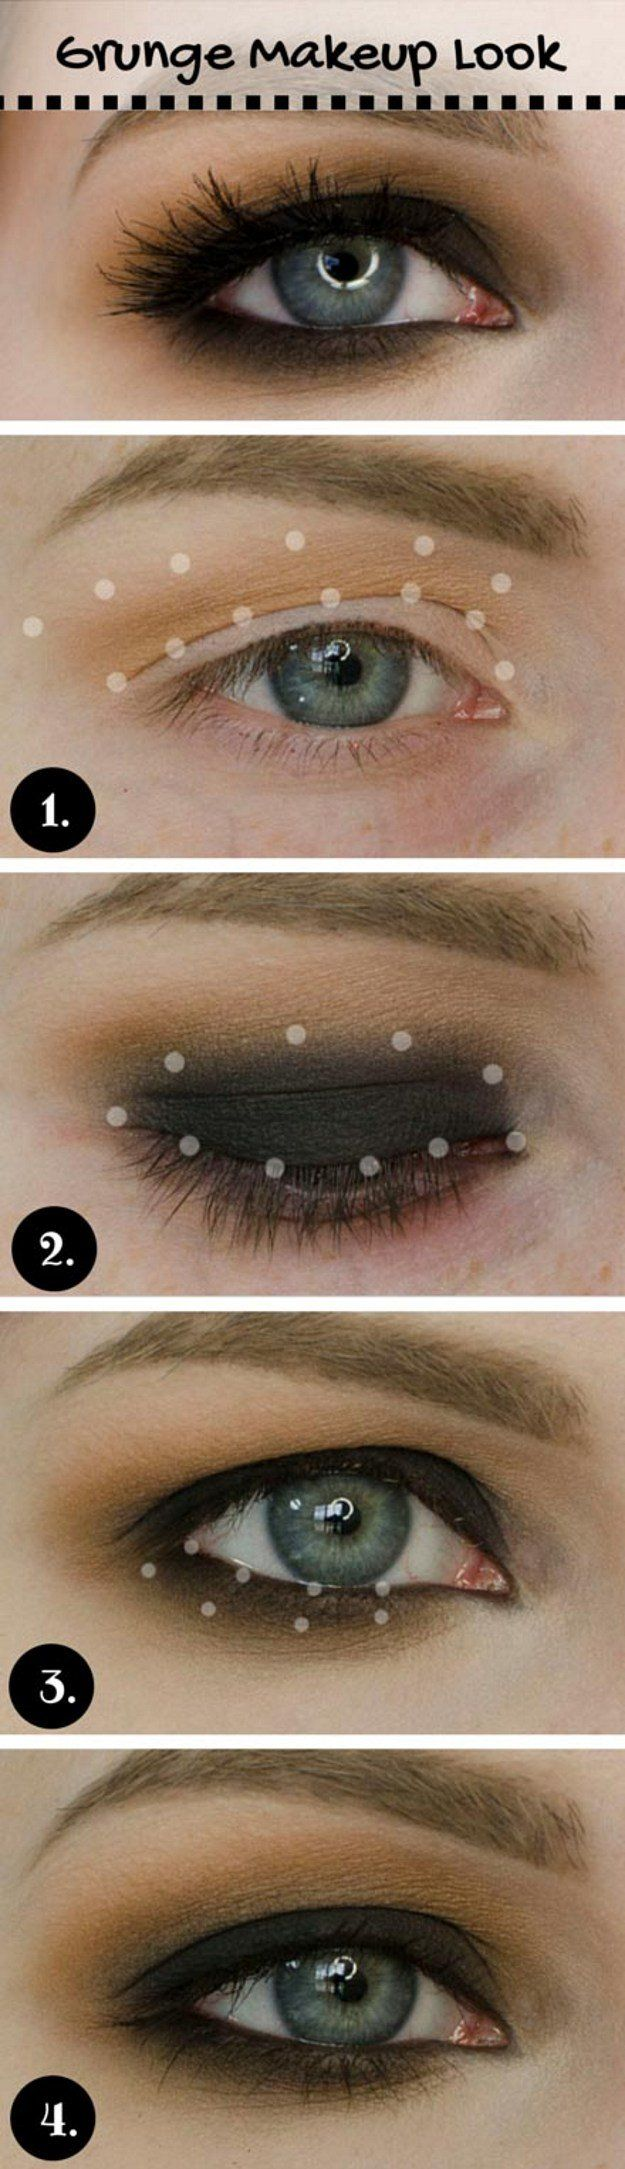 12 Makeup Tutorials For Blue EyesFacebookGoogle+InstagramPinterestTumblrTwitterYouTube